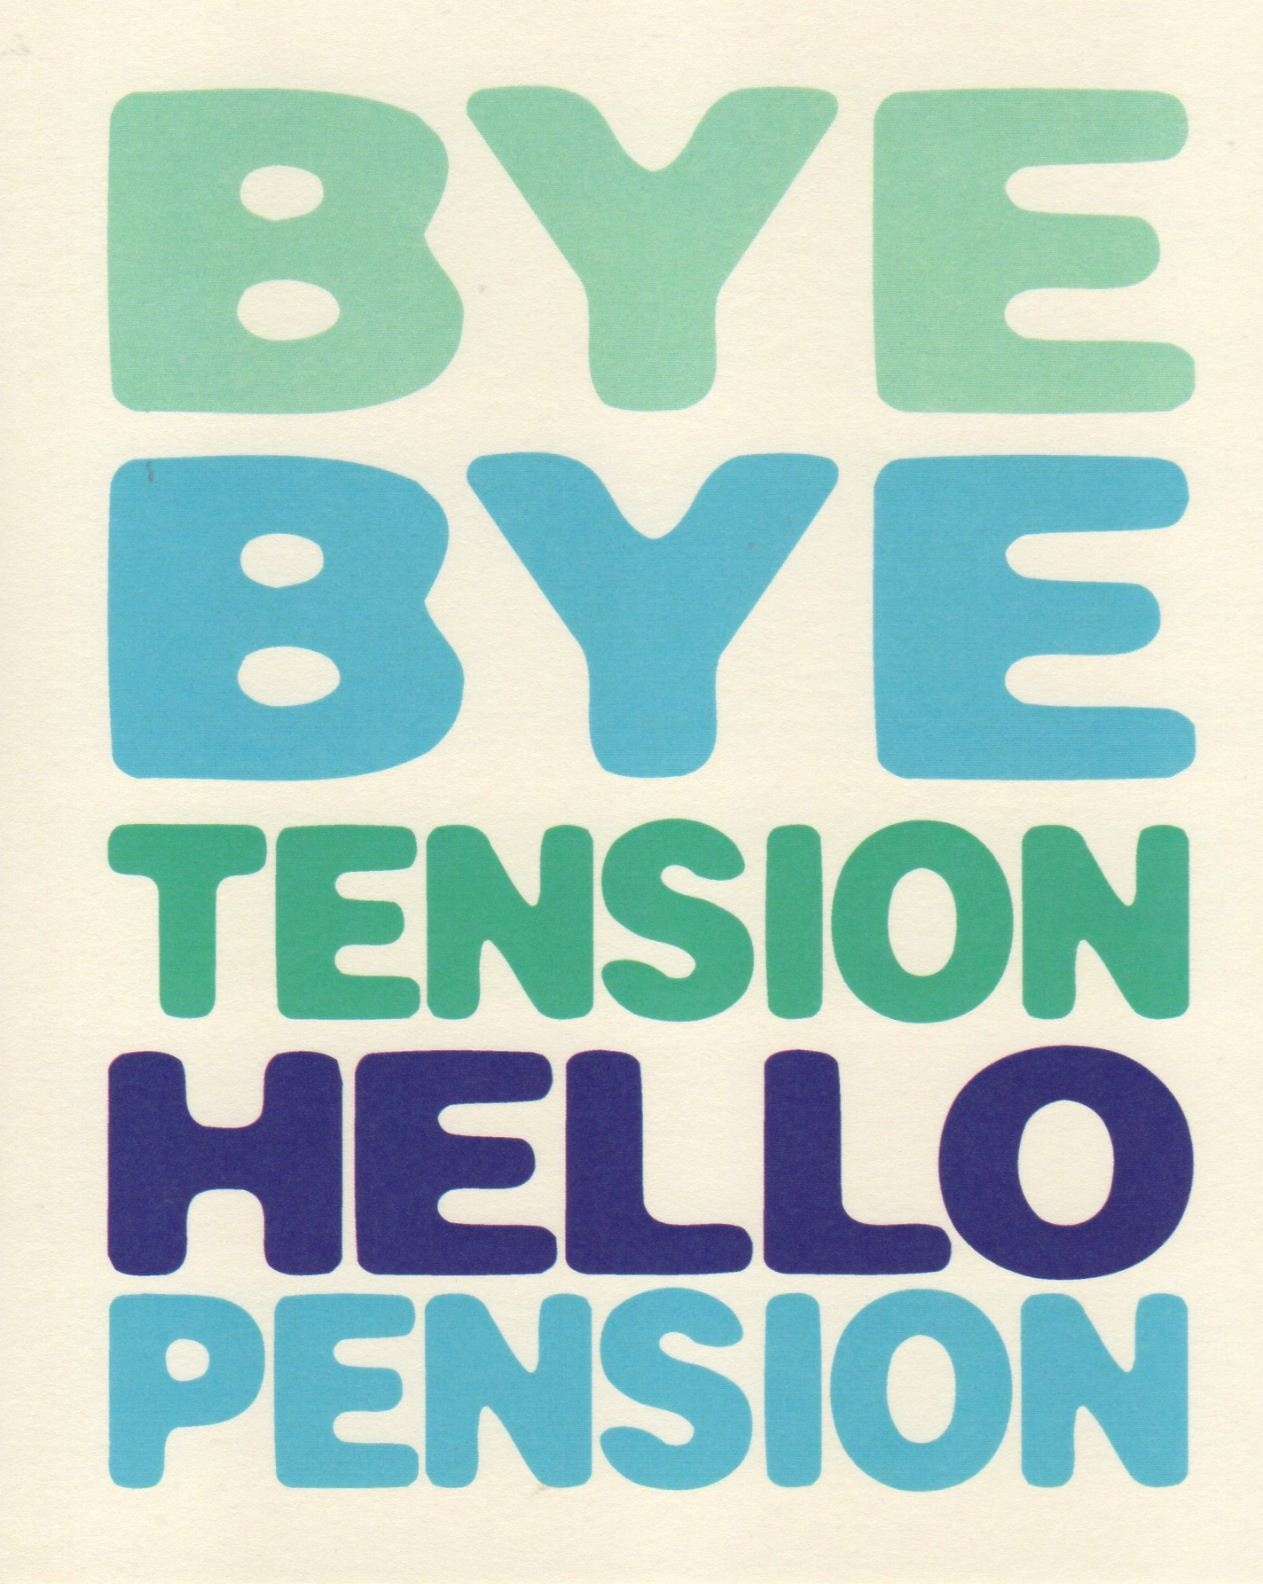 12 Beautiful Printable Retirement Cards   Kittybabylove - Free Printable Retirement Cards